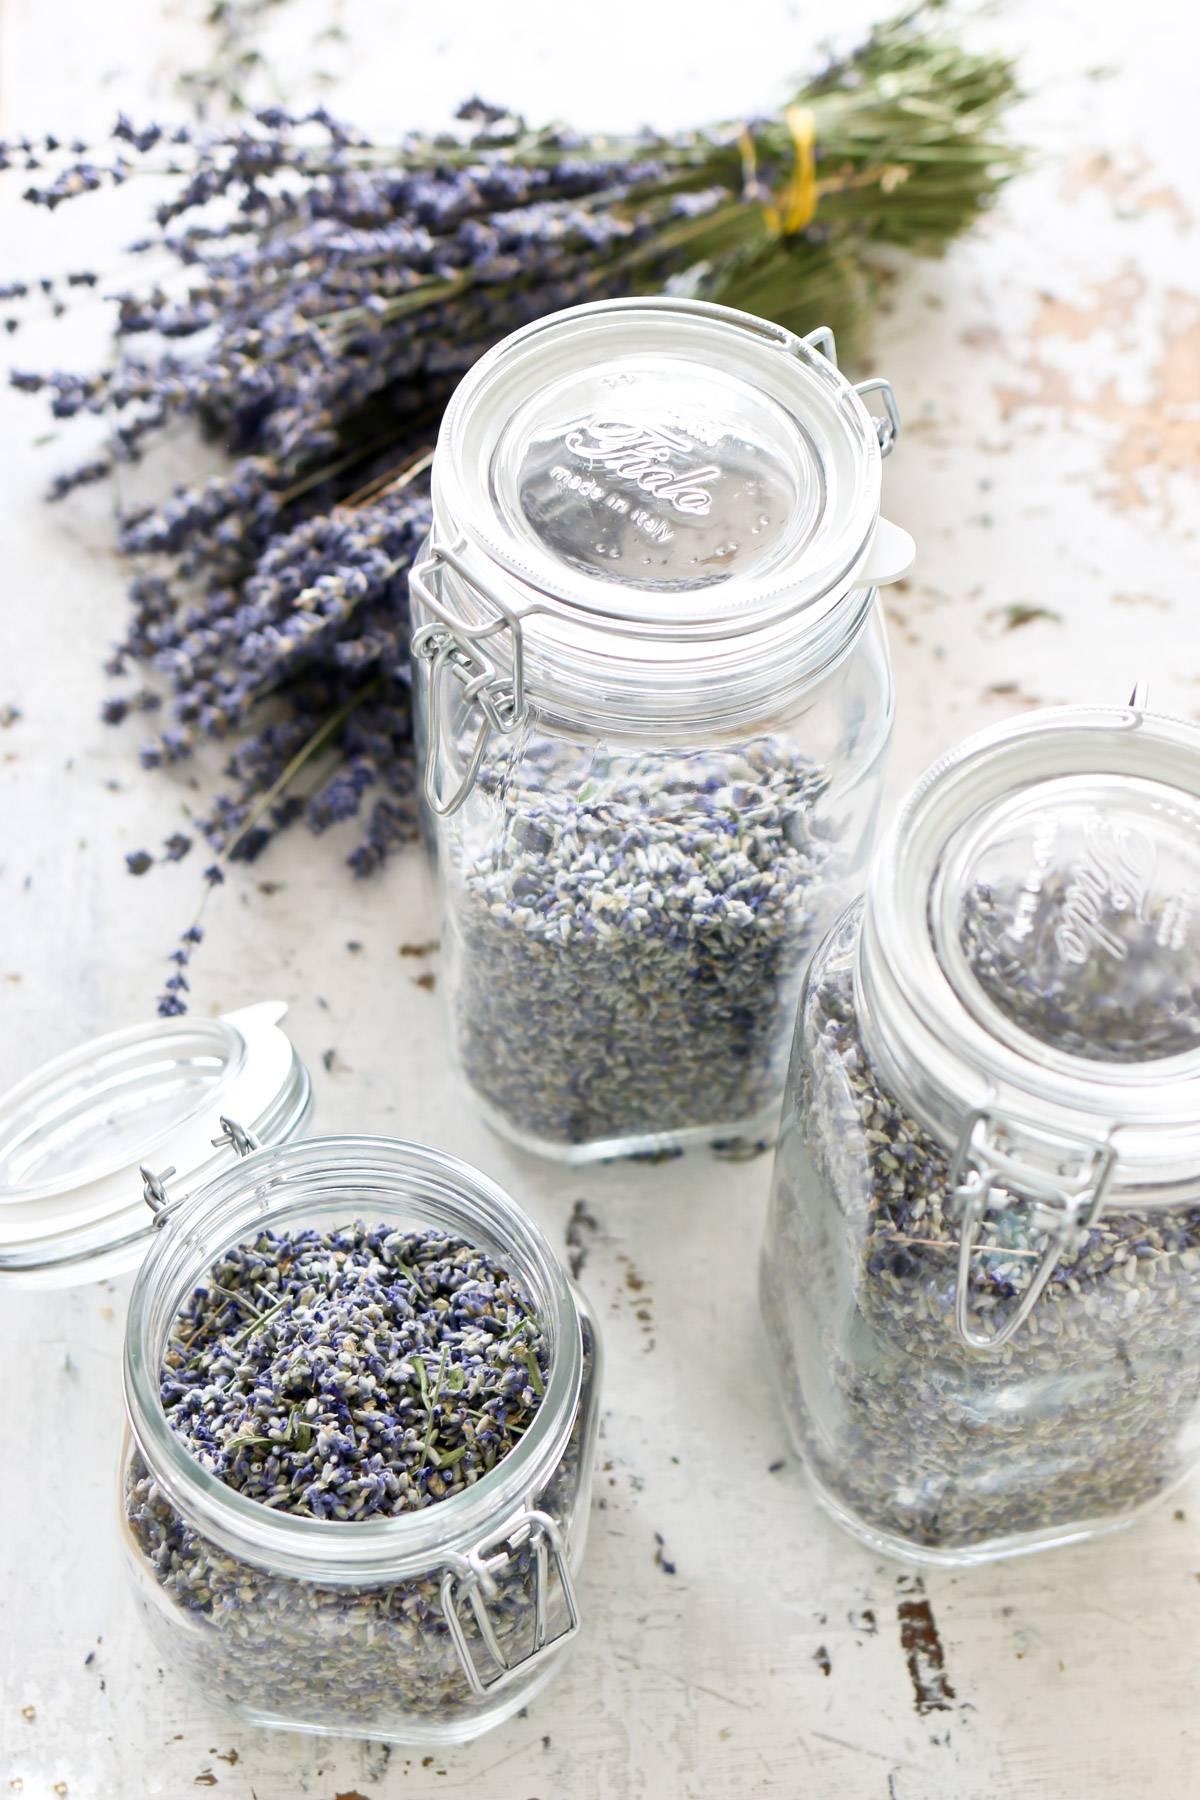 Lavendel trocknen - DIY Deko Ideen mit Lavendel